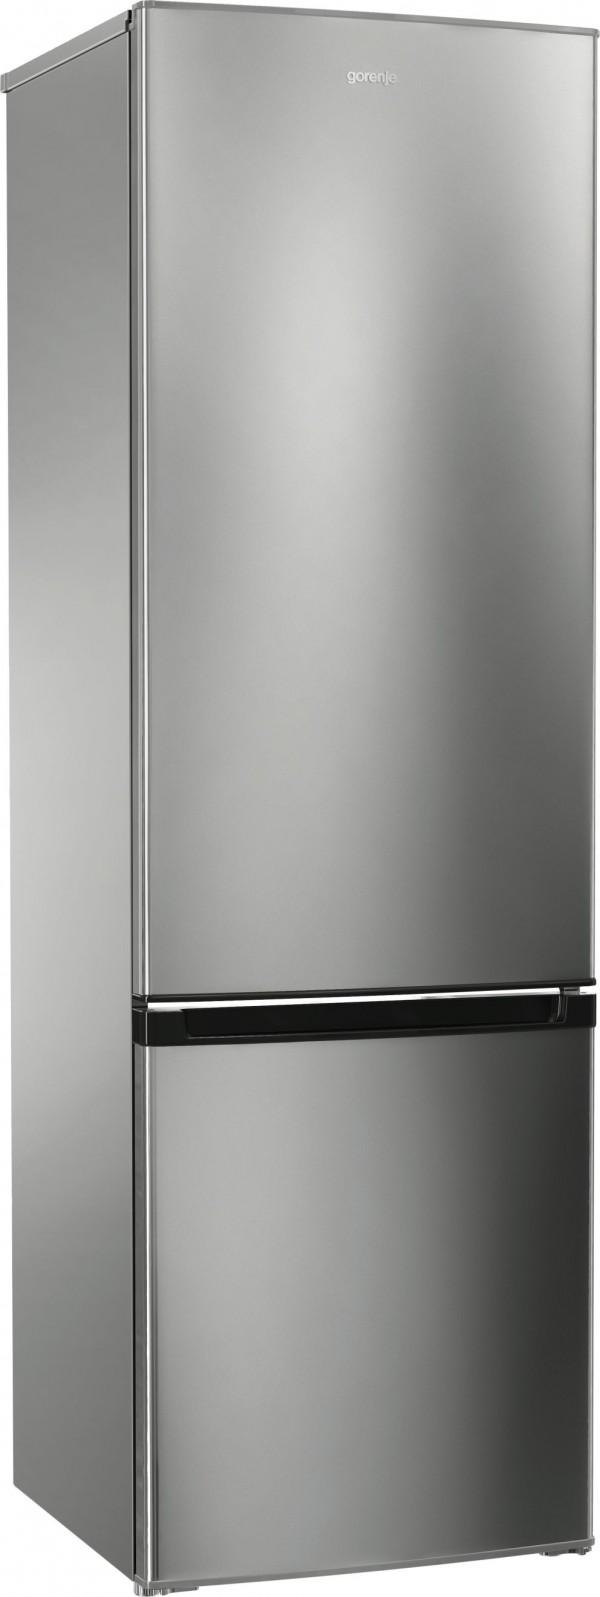 GORENJE Kombinovani frižider RK4171ANX